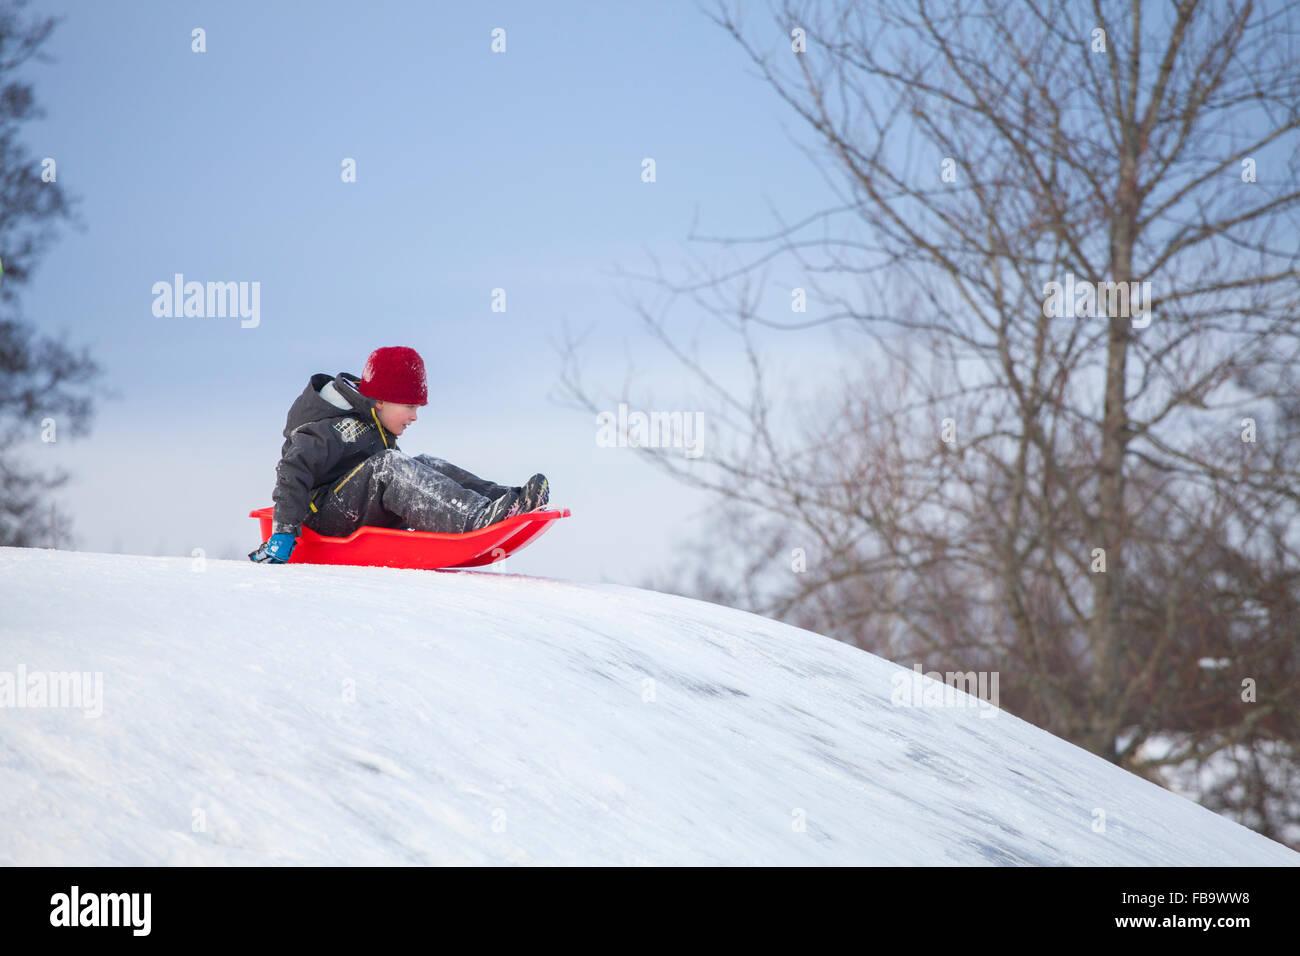 La Svezia, Vastergotland, Lerum, ragazzo (8-9) su sled Immagini Stock